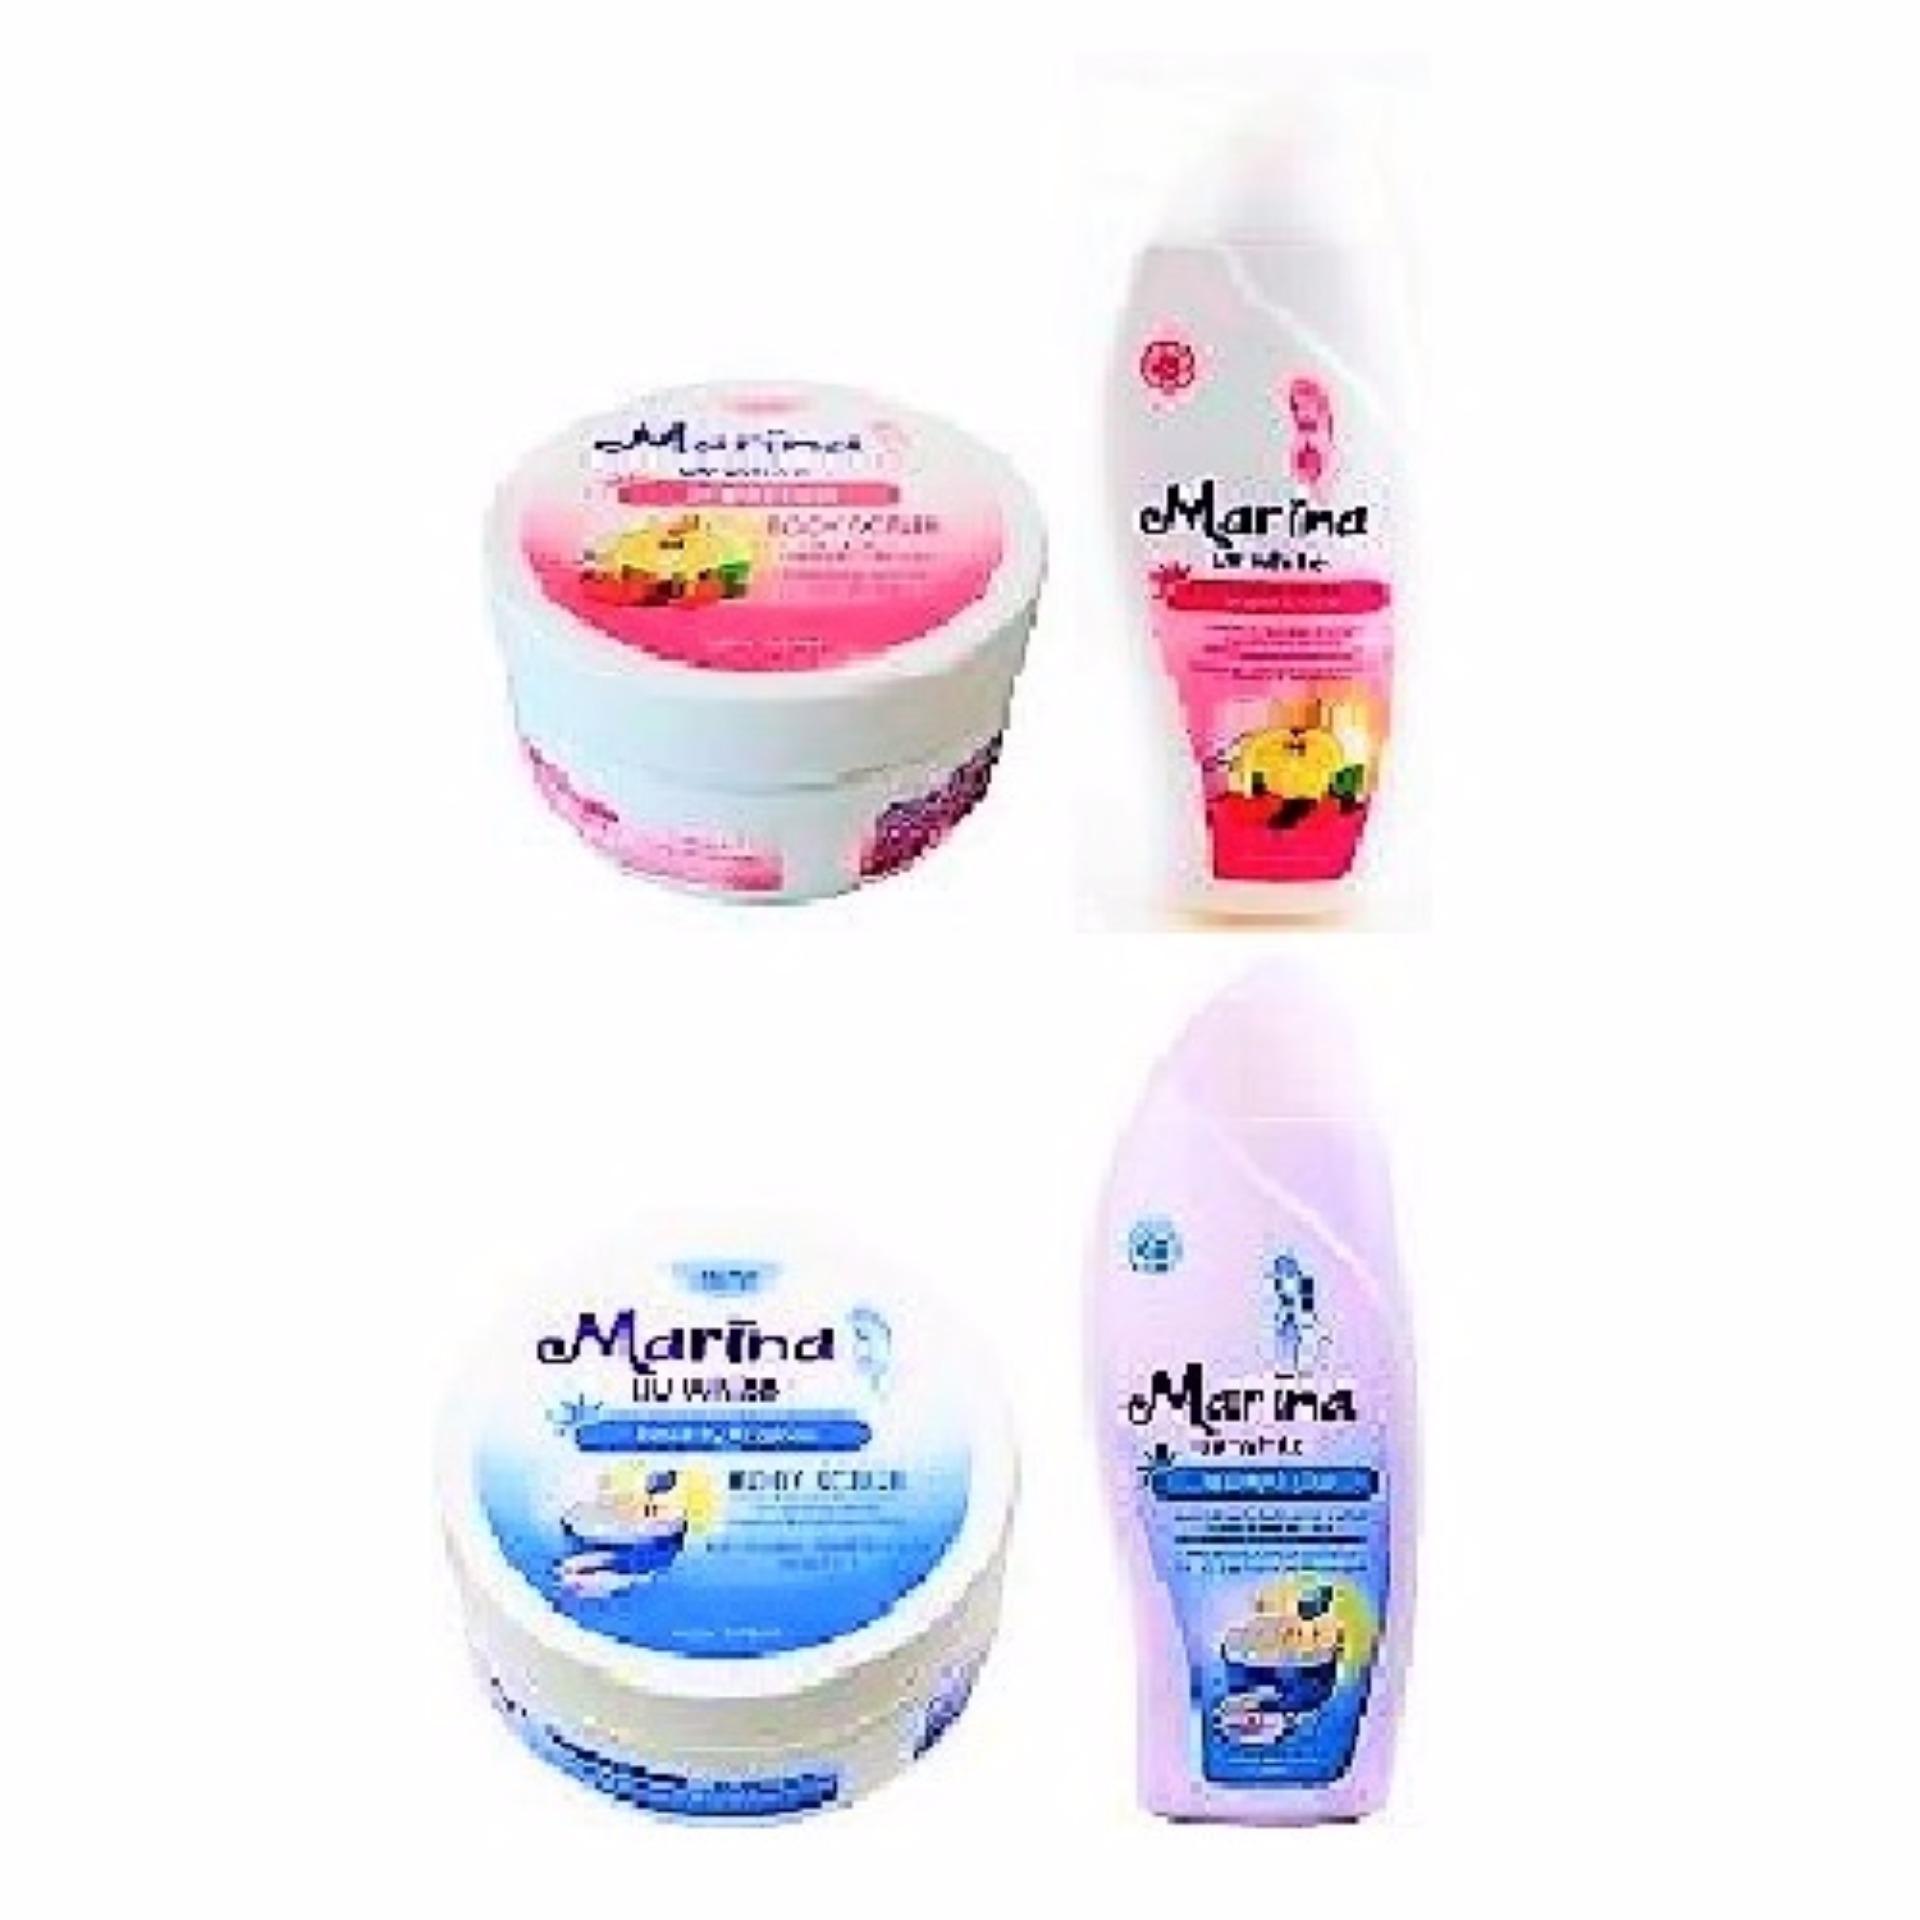 Diskon Penjualan Marina Body Scrub 200 Ml Hand Lotion 100 Satto Ampamp Whitening Moisturizer 200ml 1 Pakethealthy Glow